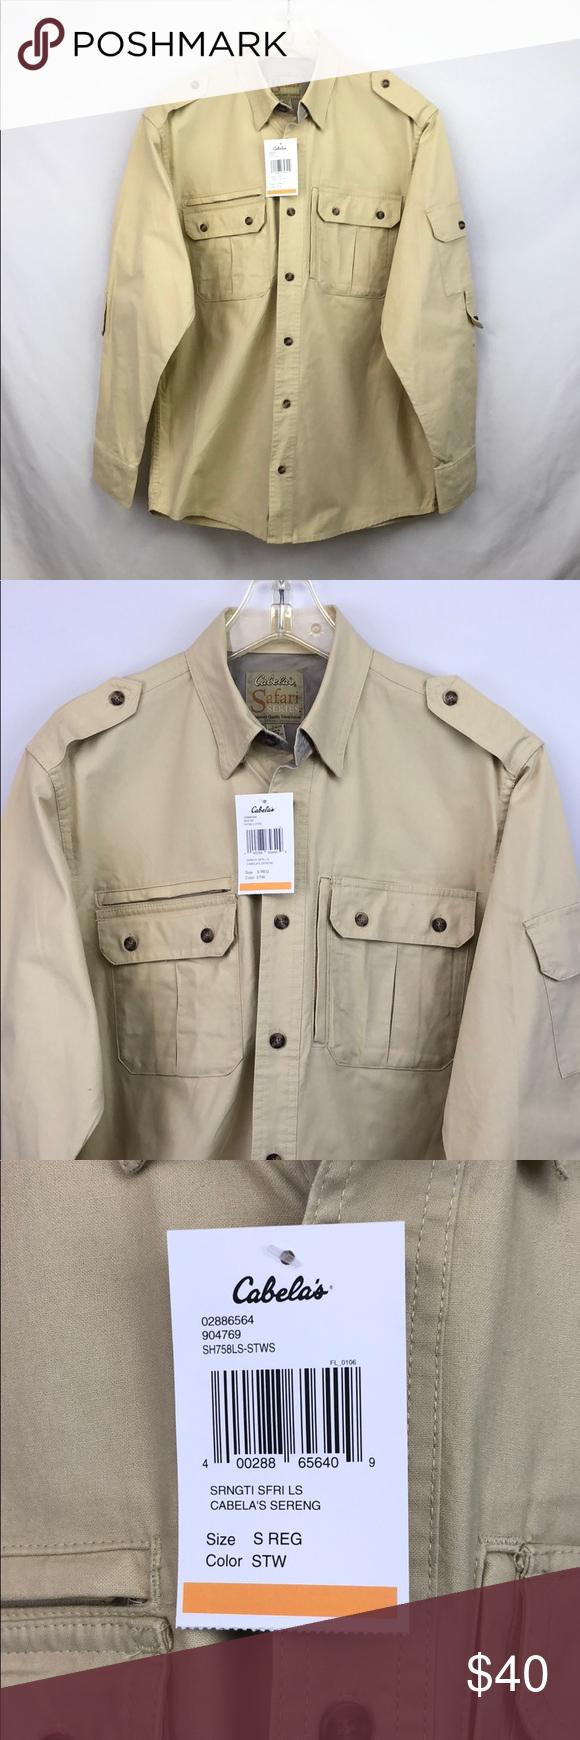 Cabela S Men S Serengeti Safari Shirt Small Nwt Size Small New With Tags Cabela S Shirts Casual Button Dow Safari Shirt Casual Shirts For Men Casual Shirts